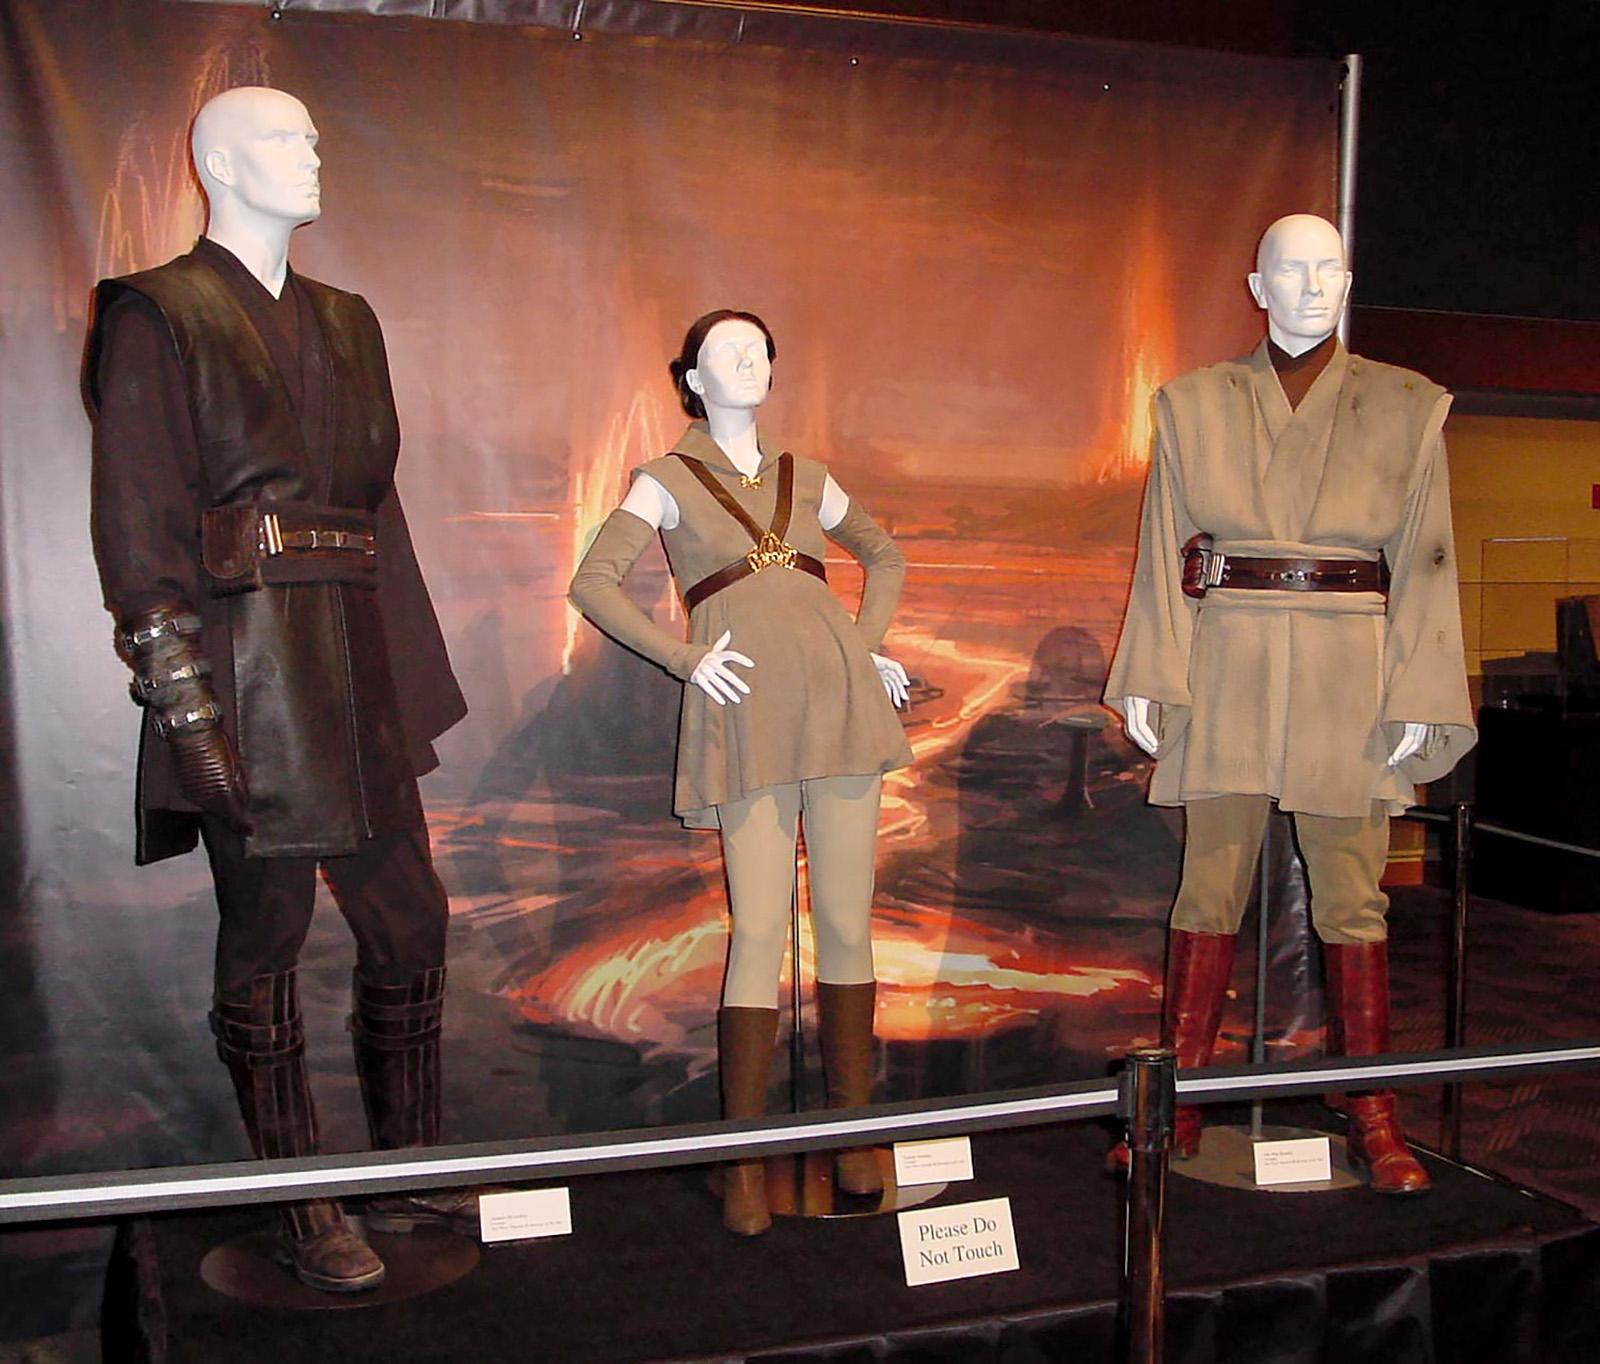 EP3 Anakin, Padme, and Obi-Wan